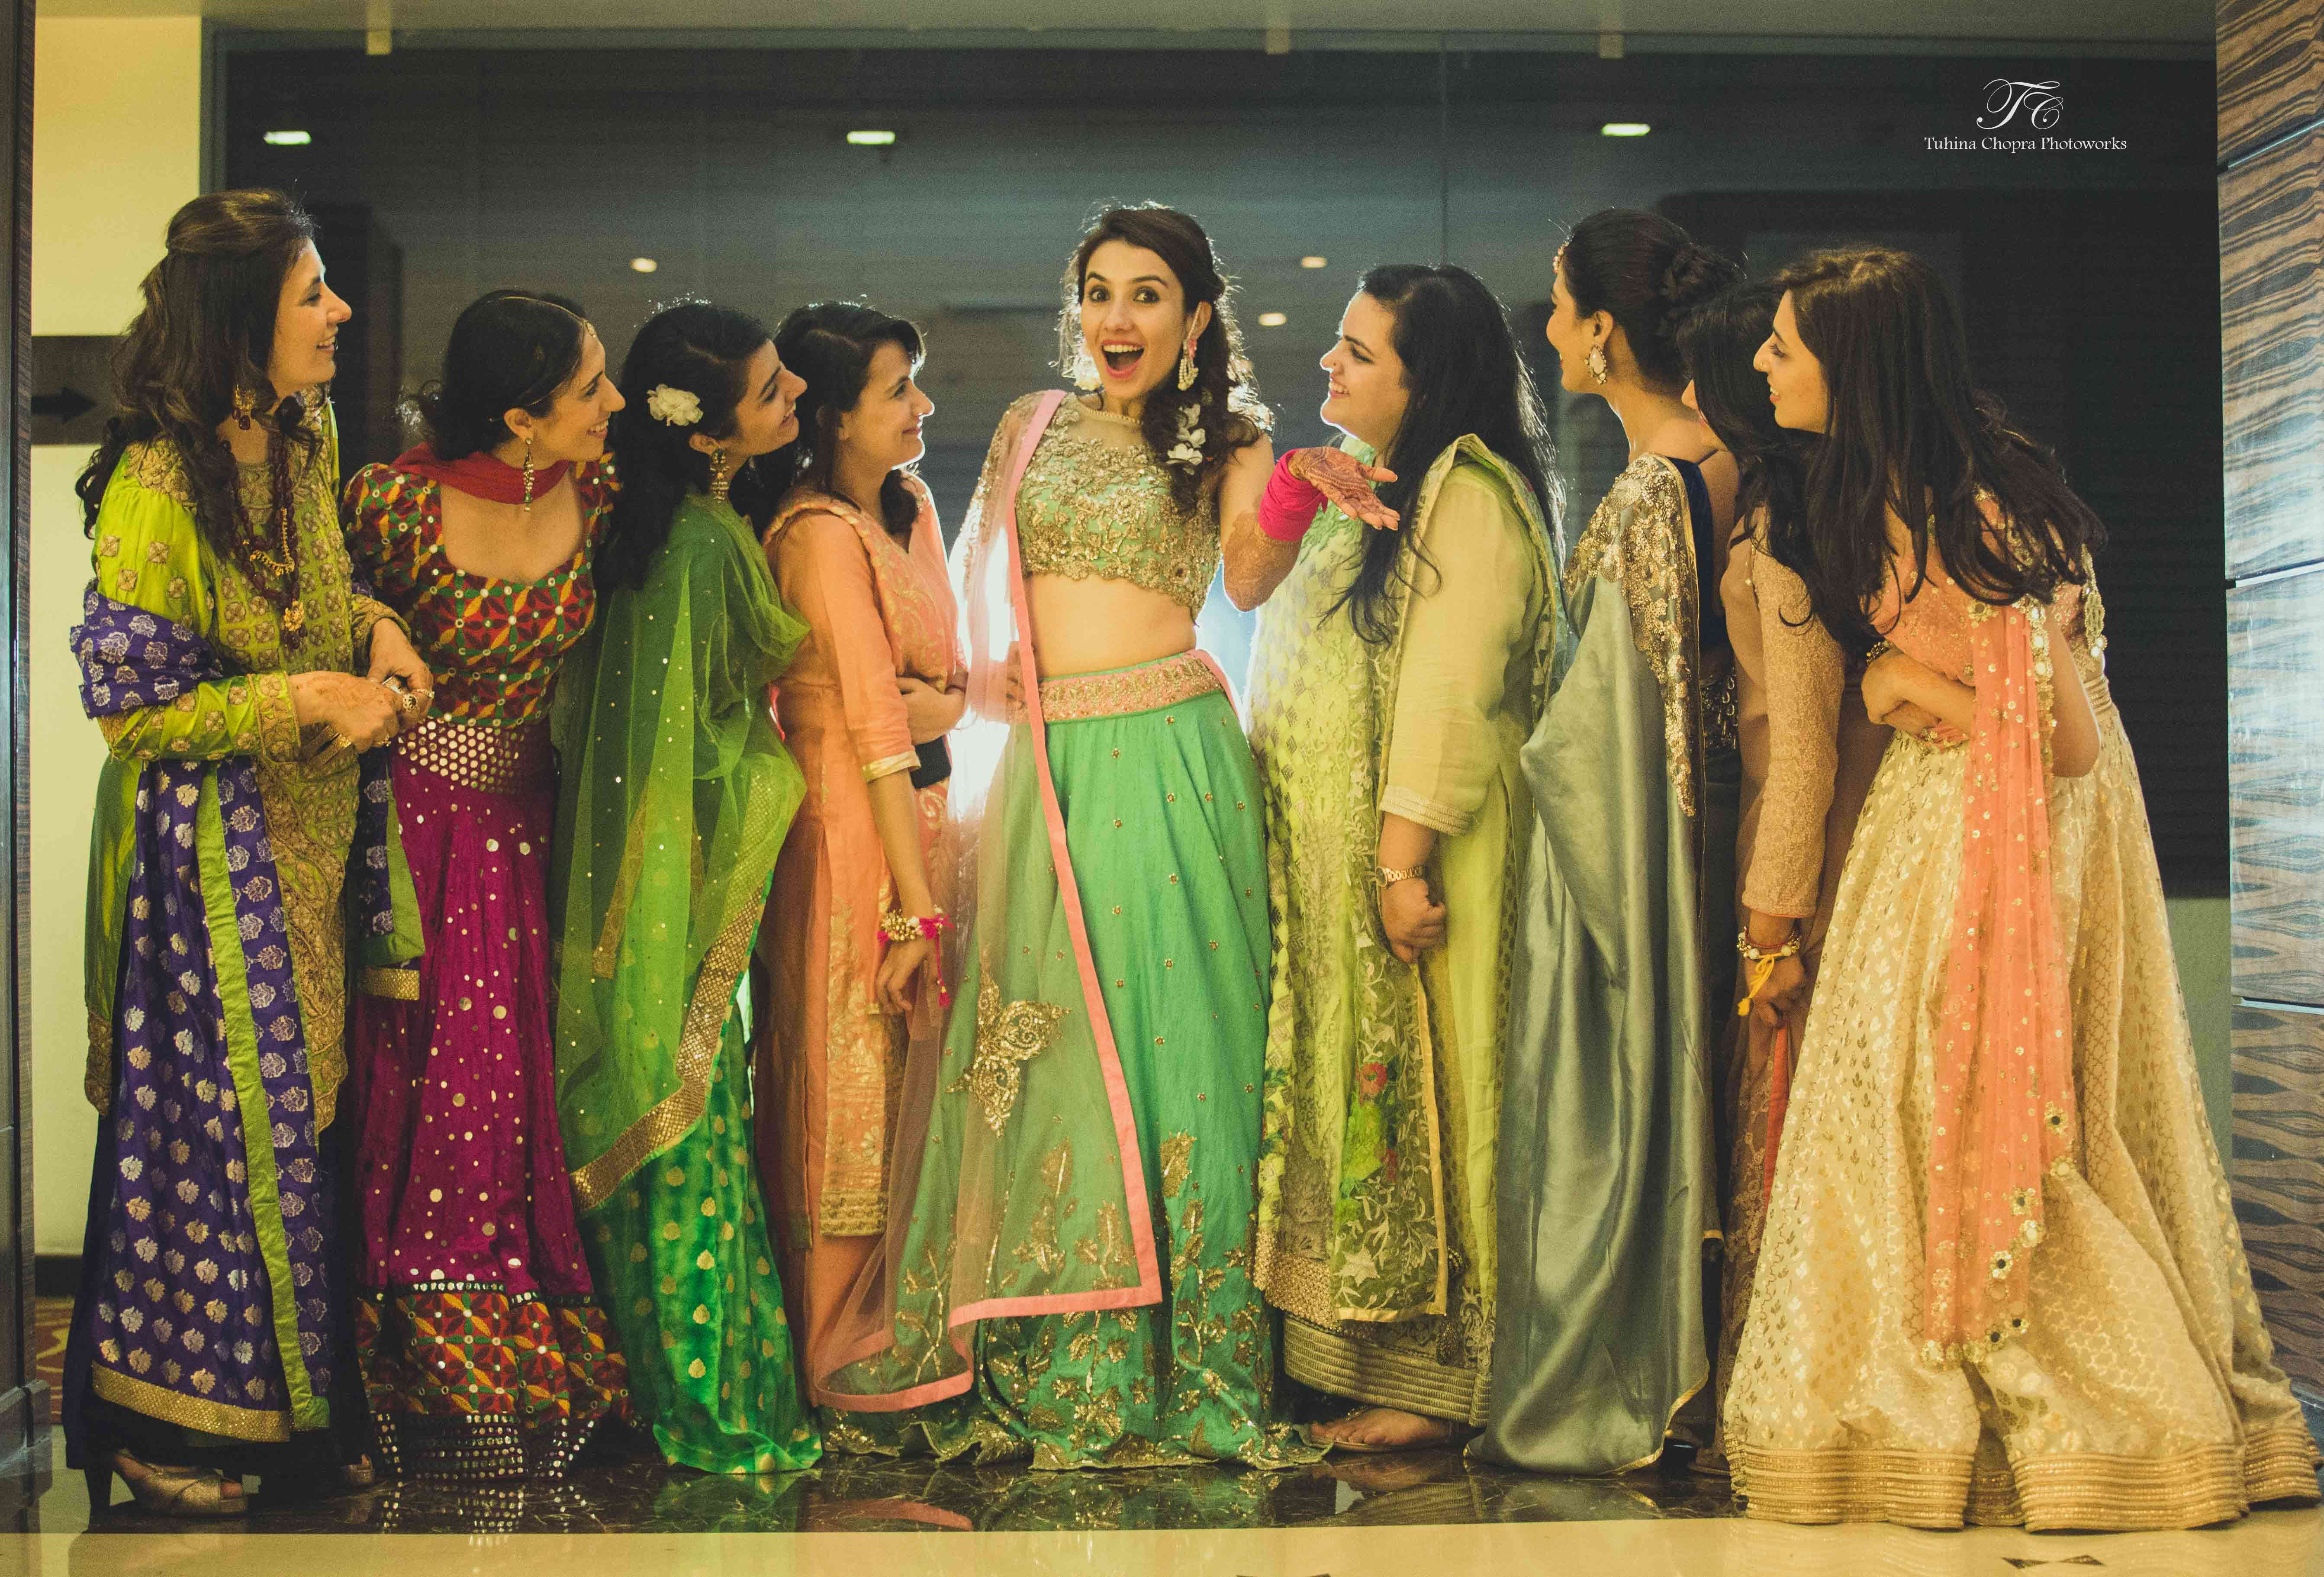 bride with bridesmaids:tuhina chopra photoworks